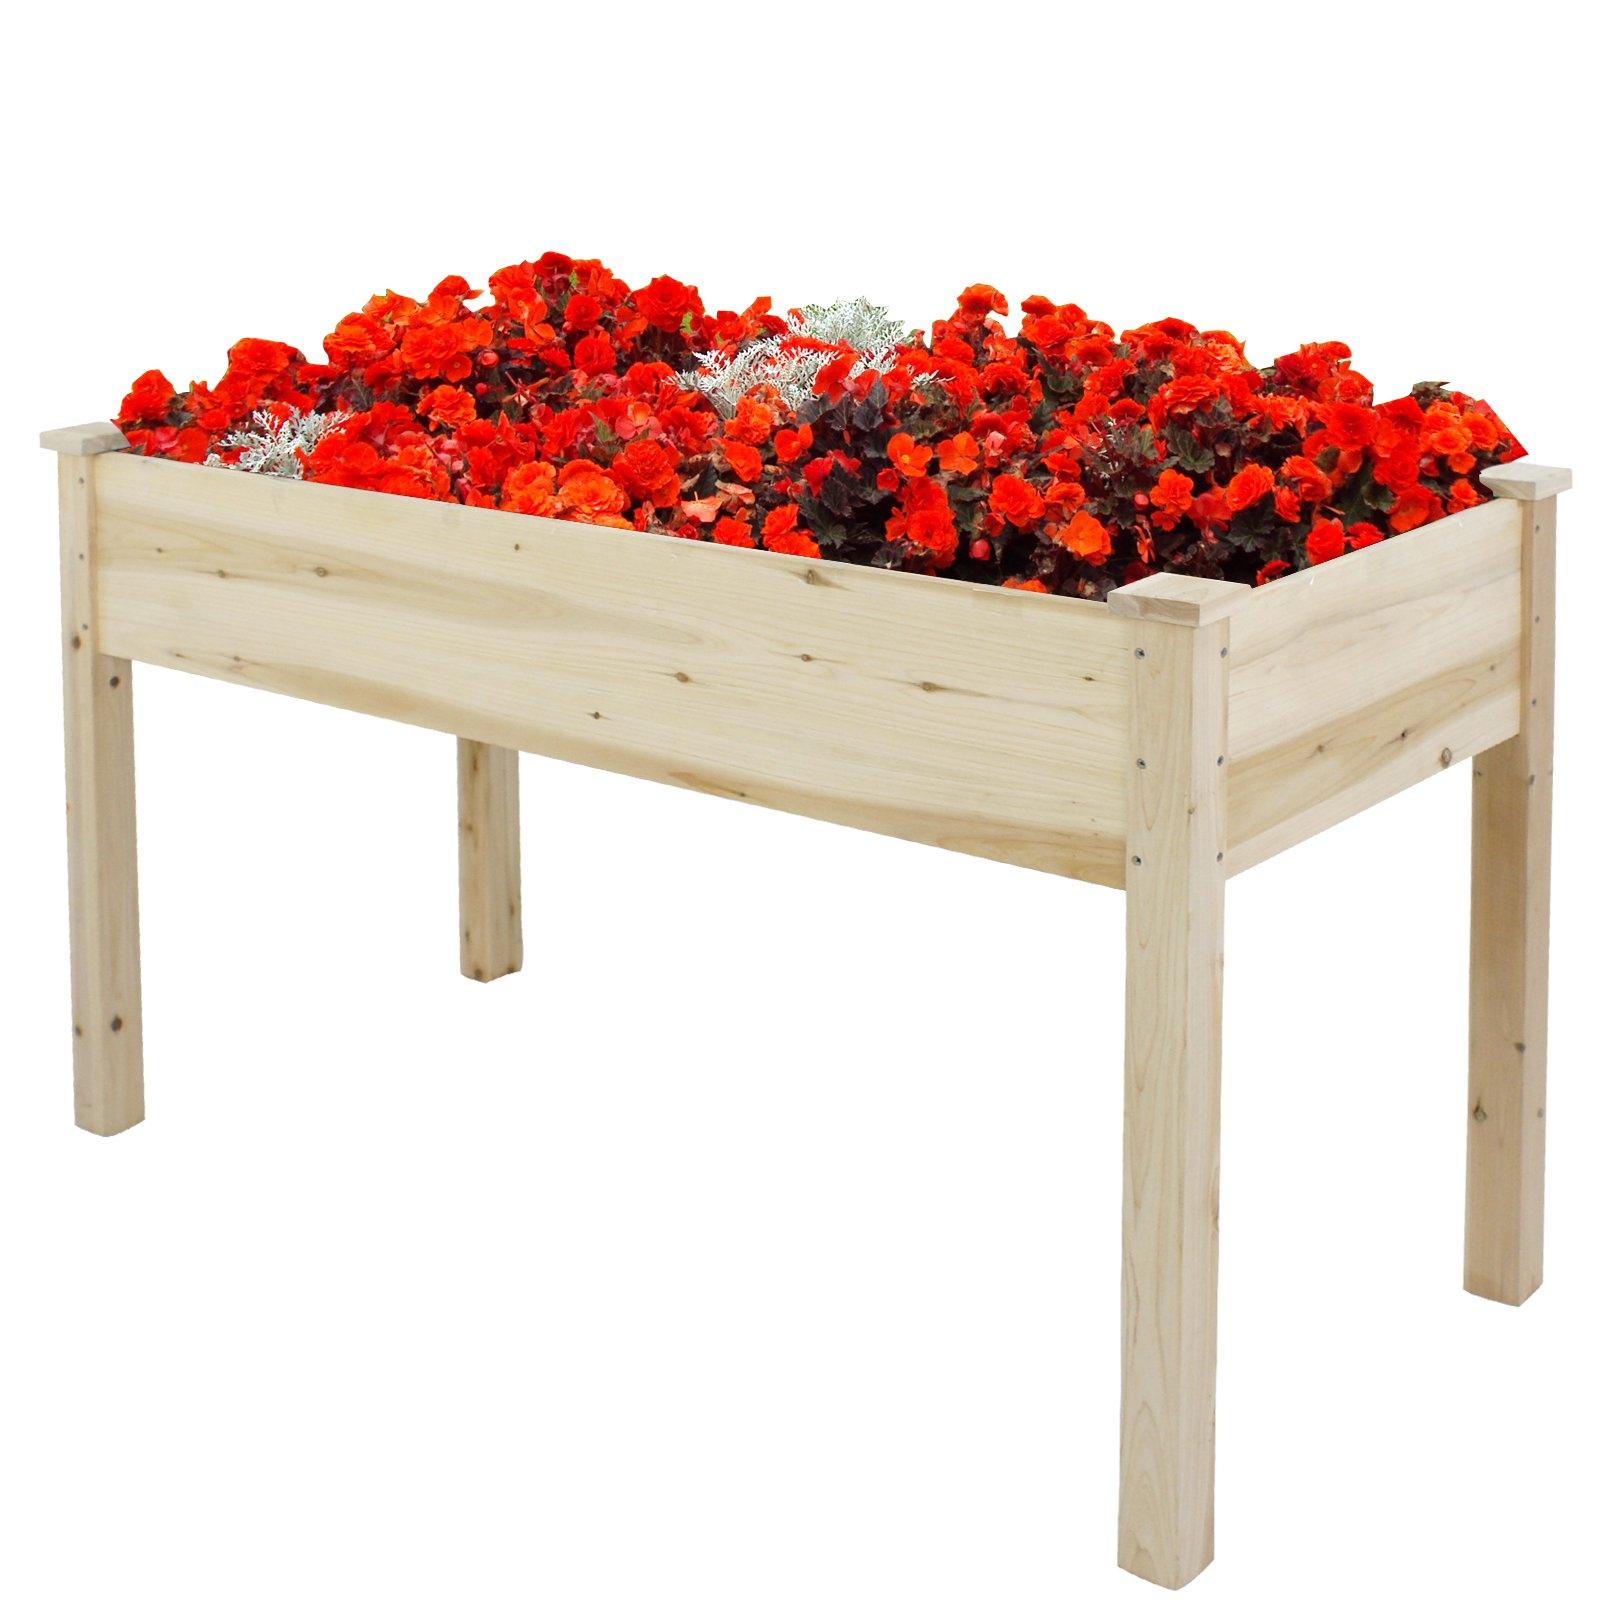 Nova Microdermabrasion Wooden Raised Garden Bed Elevated Planter Kit Growing Herb,Vegetable,Flower,Fruits For Patio Yard Gardening